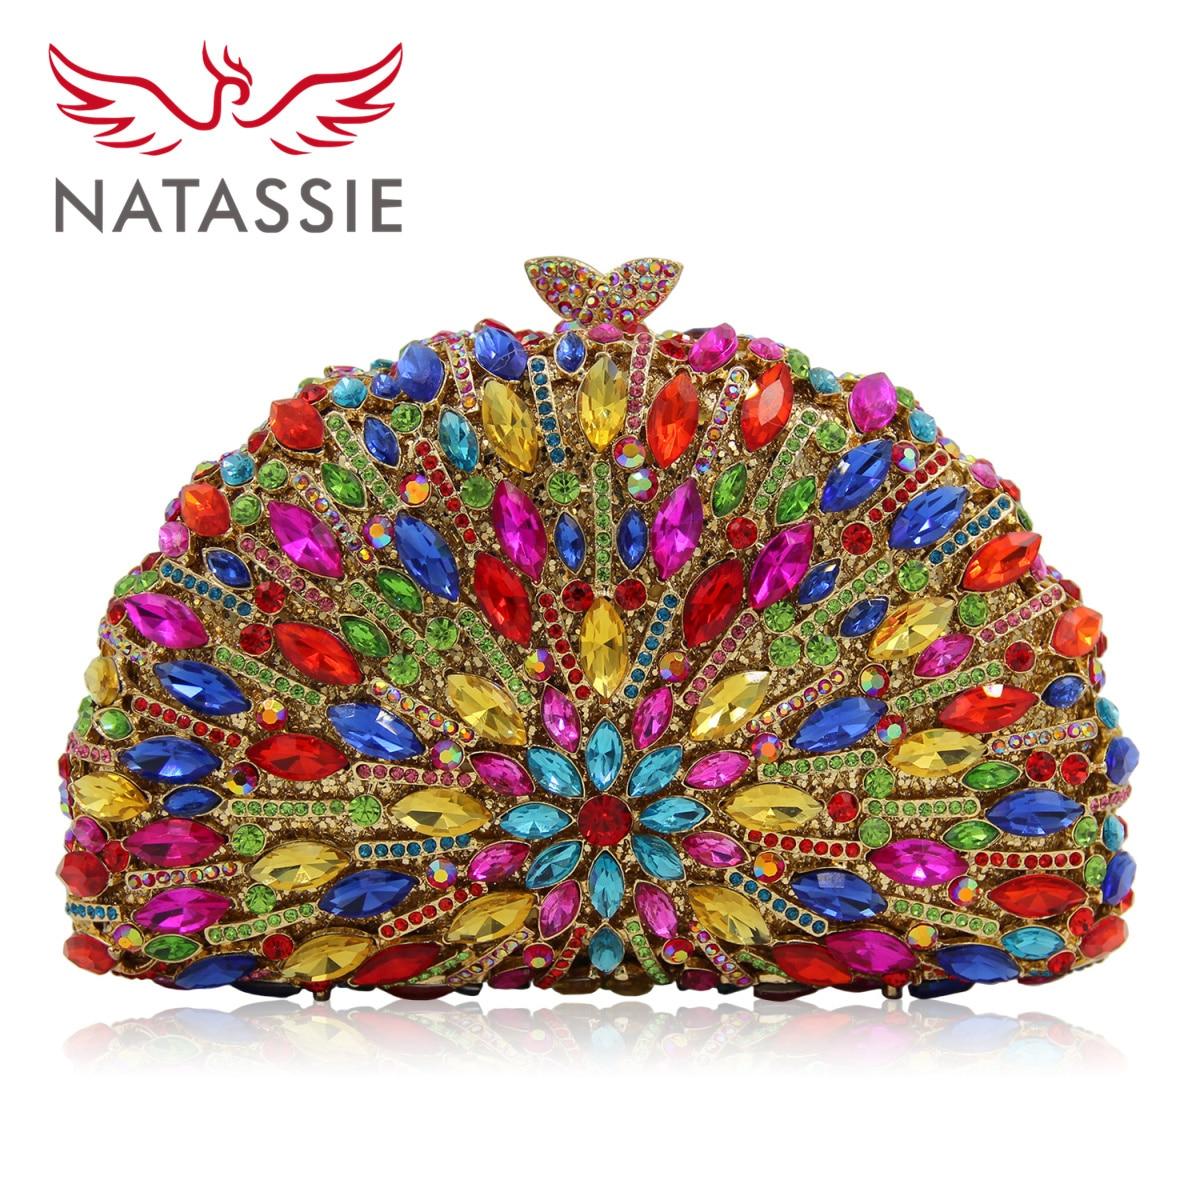 Natassie Women Luxury Rhinestone Clutch Evening Bags Ladies Crystal Wedding Purses Dinner Party Bag Gold